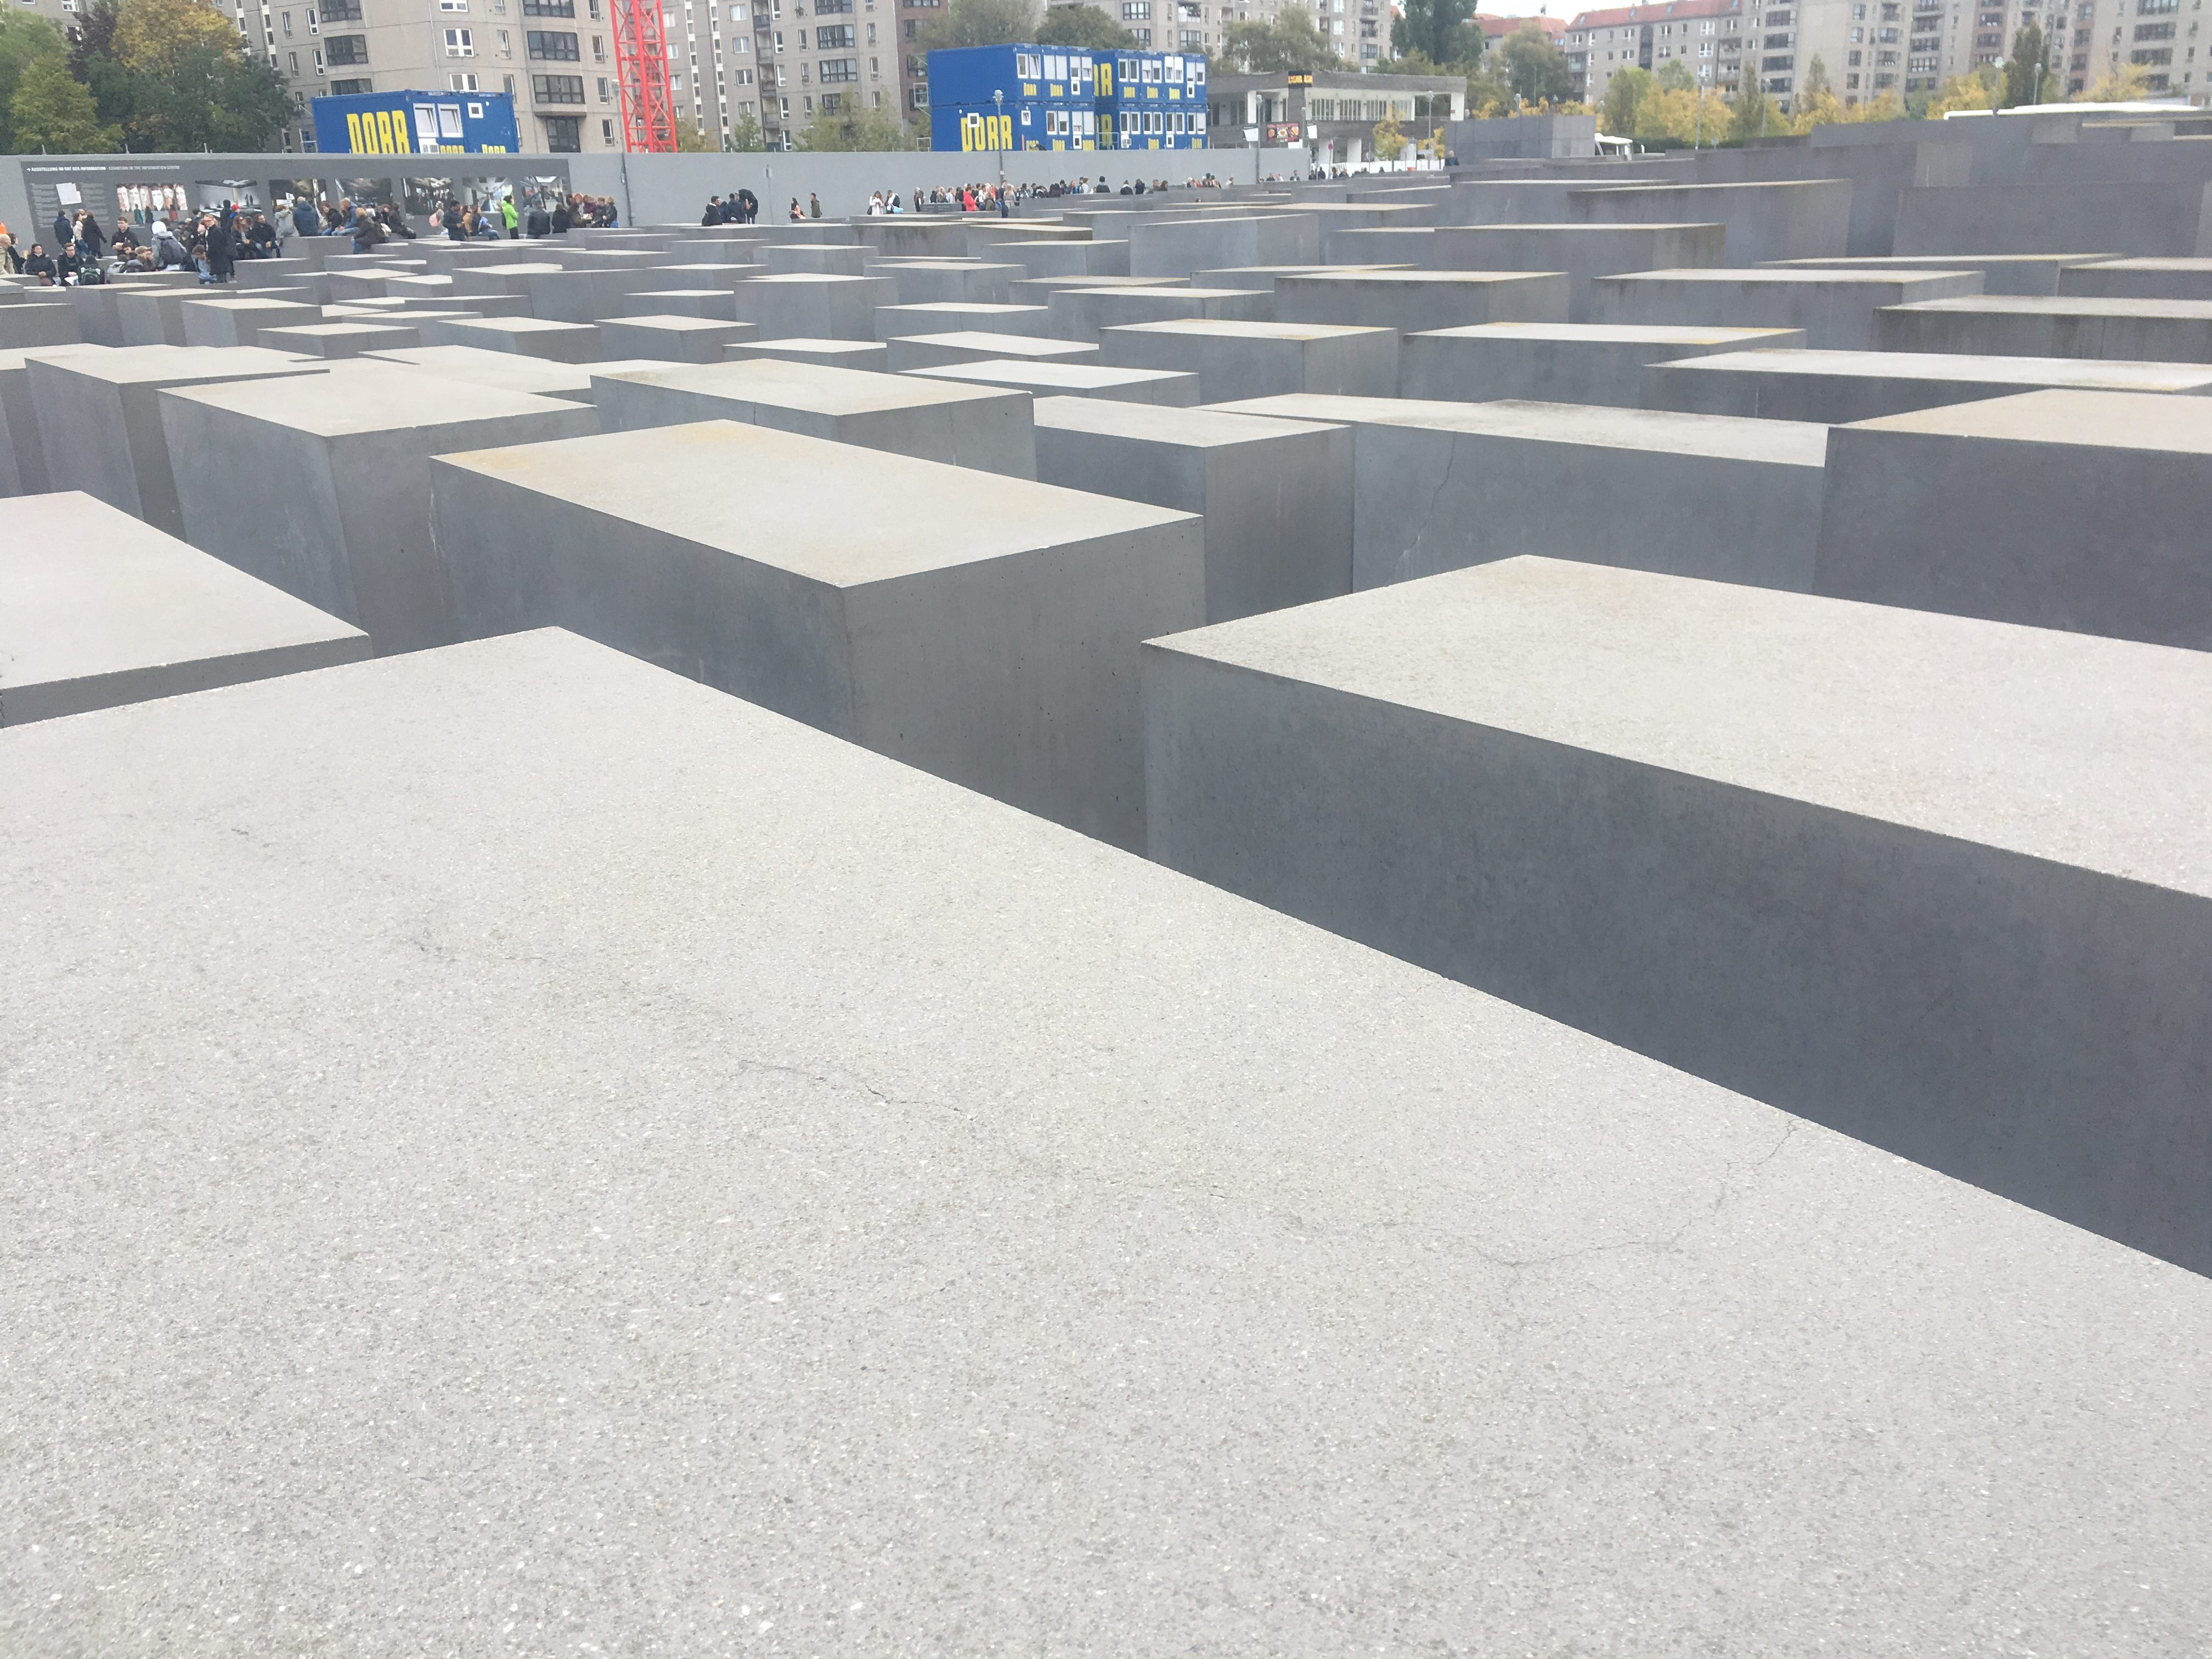 Memorial to Jewish victims of Nazis